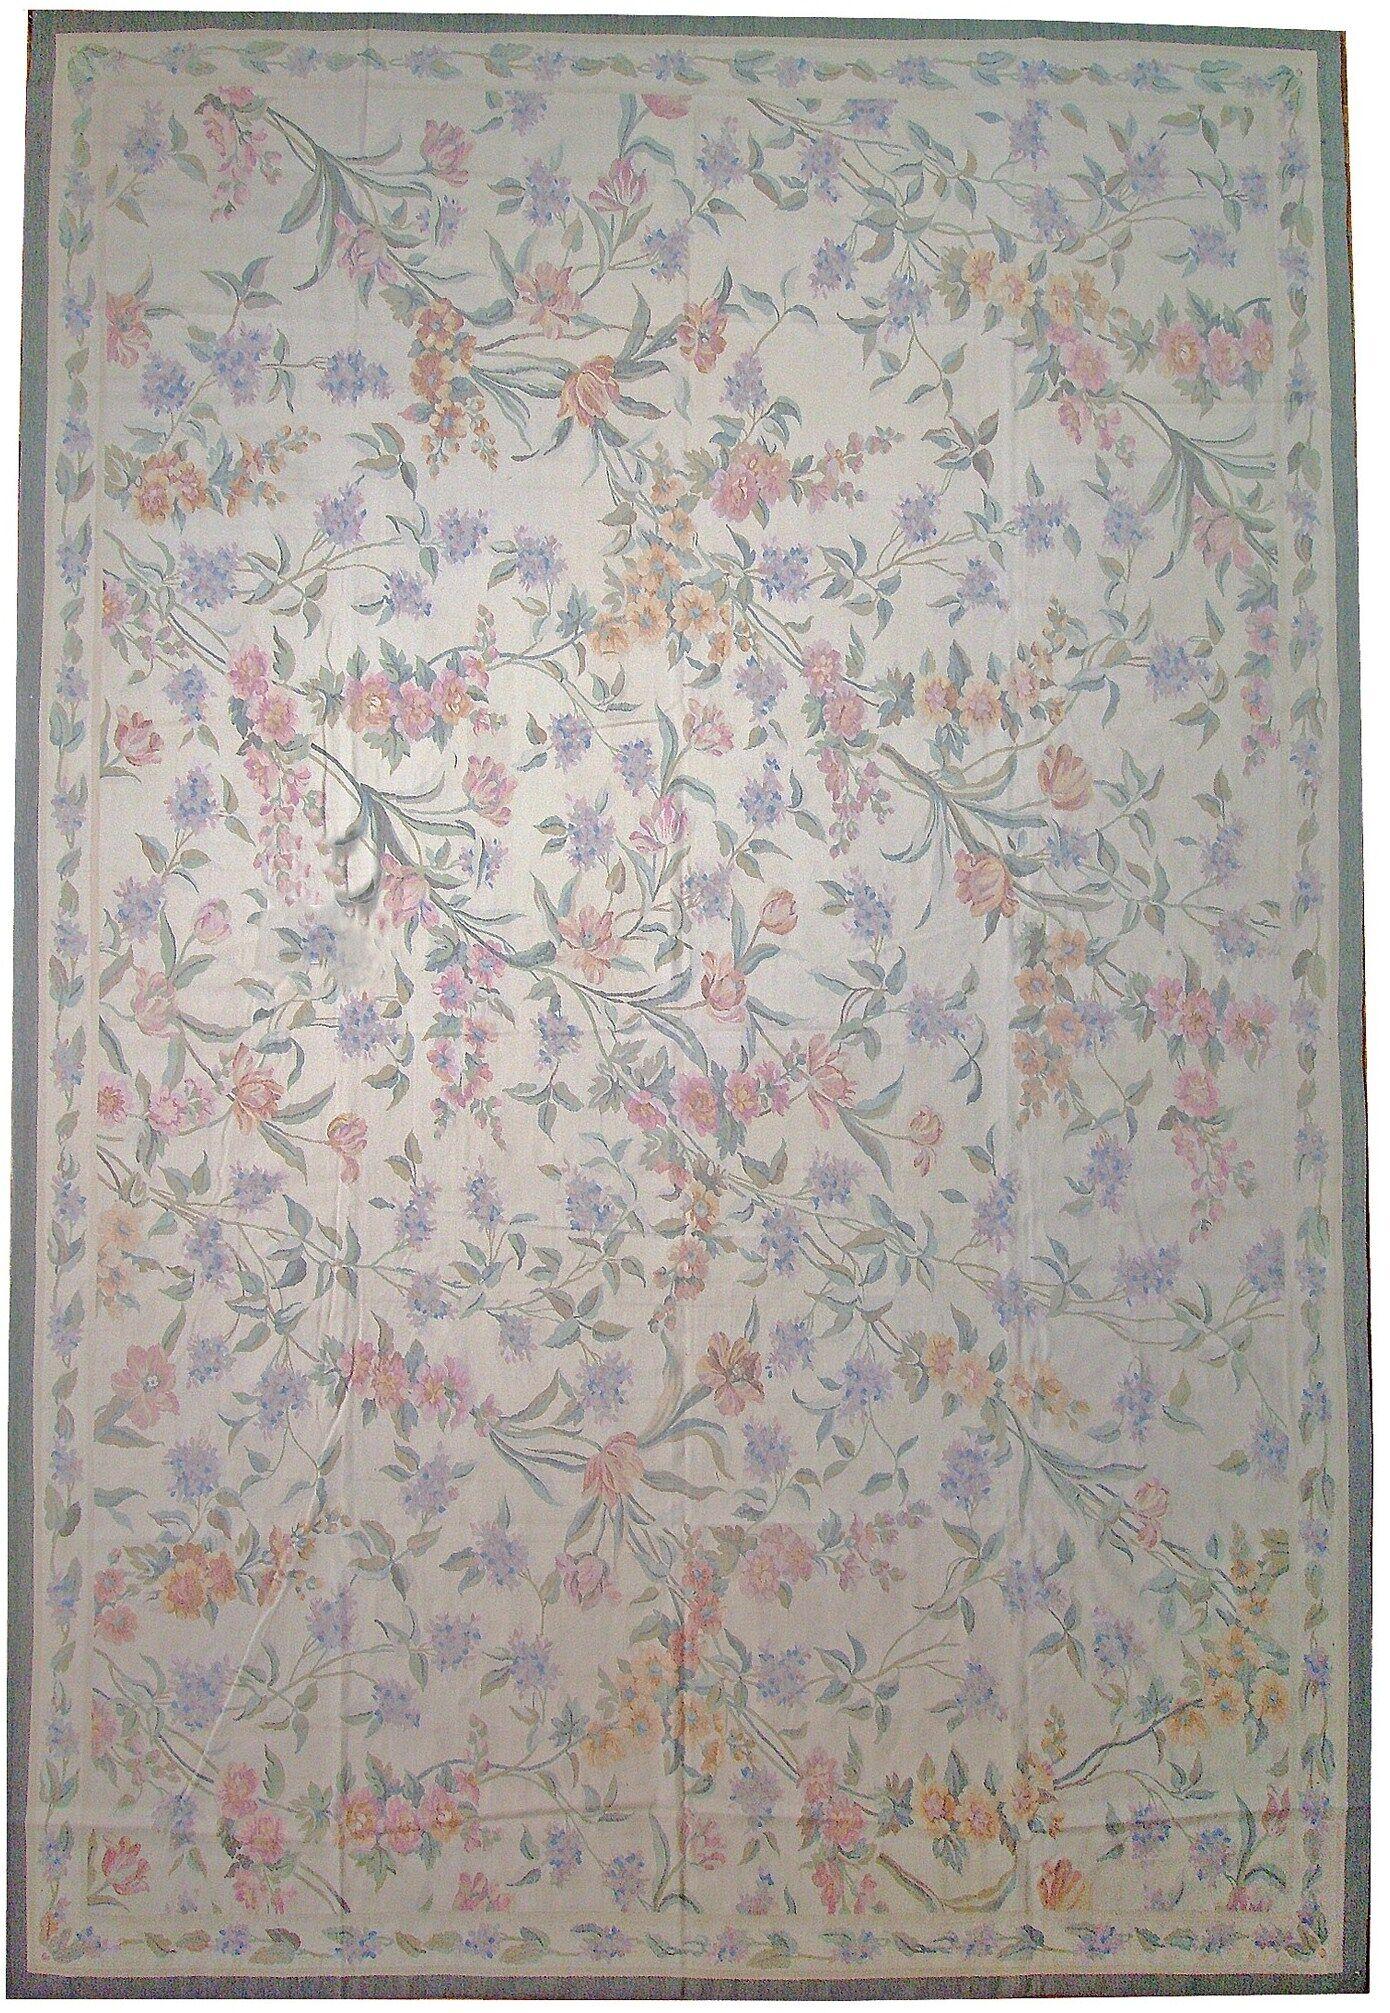 Aubusson Hand-Woven Wool Beige/Purple/Gray Area Rug Rug Size: Rectangle 6'1